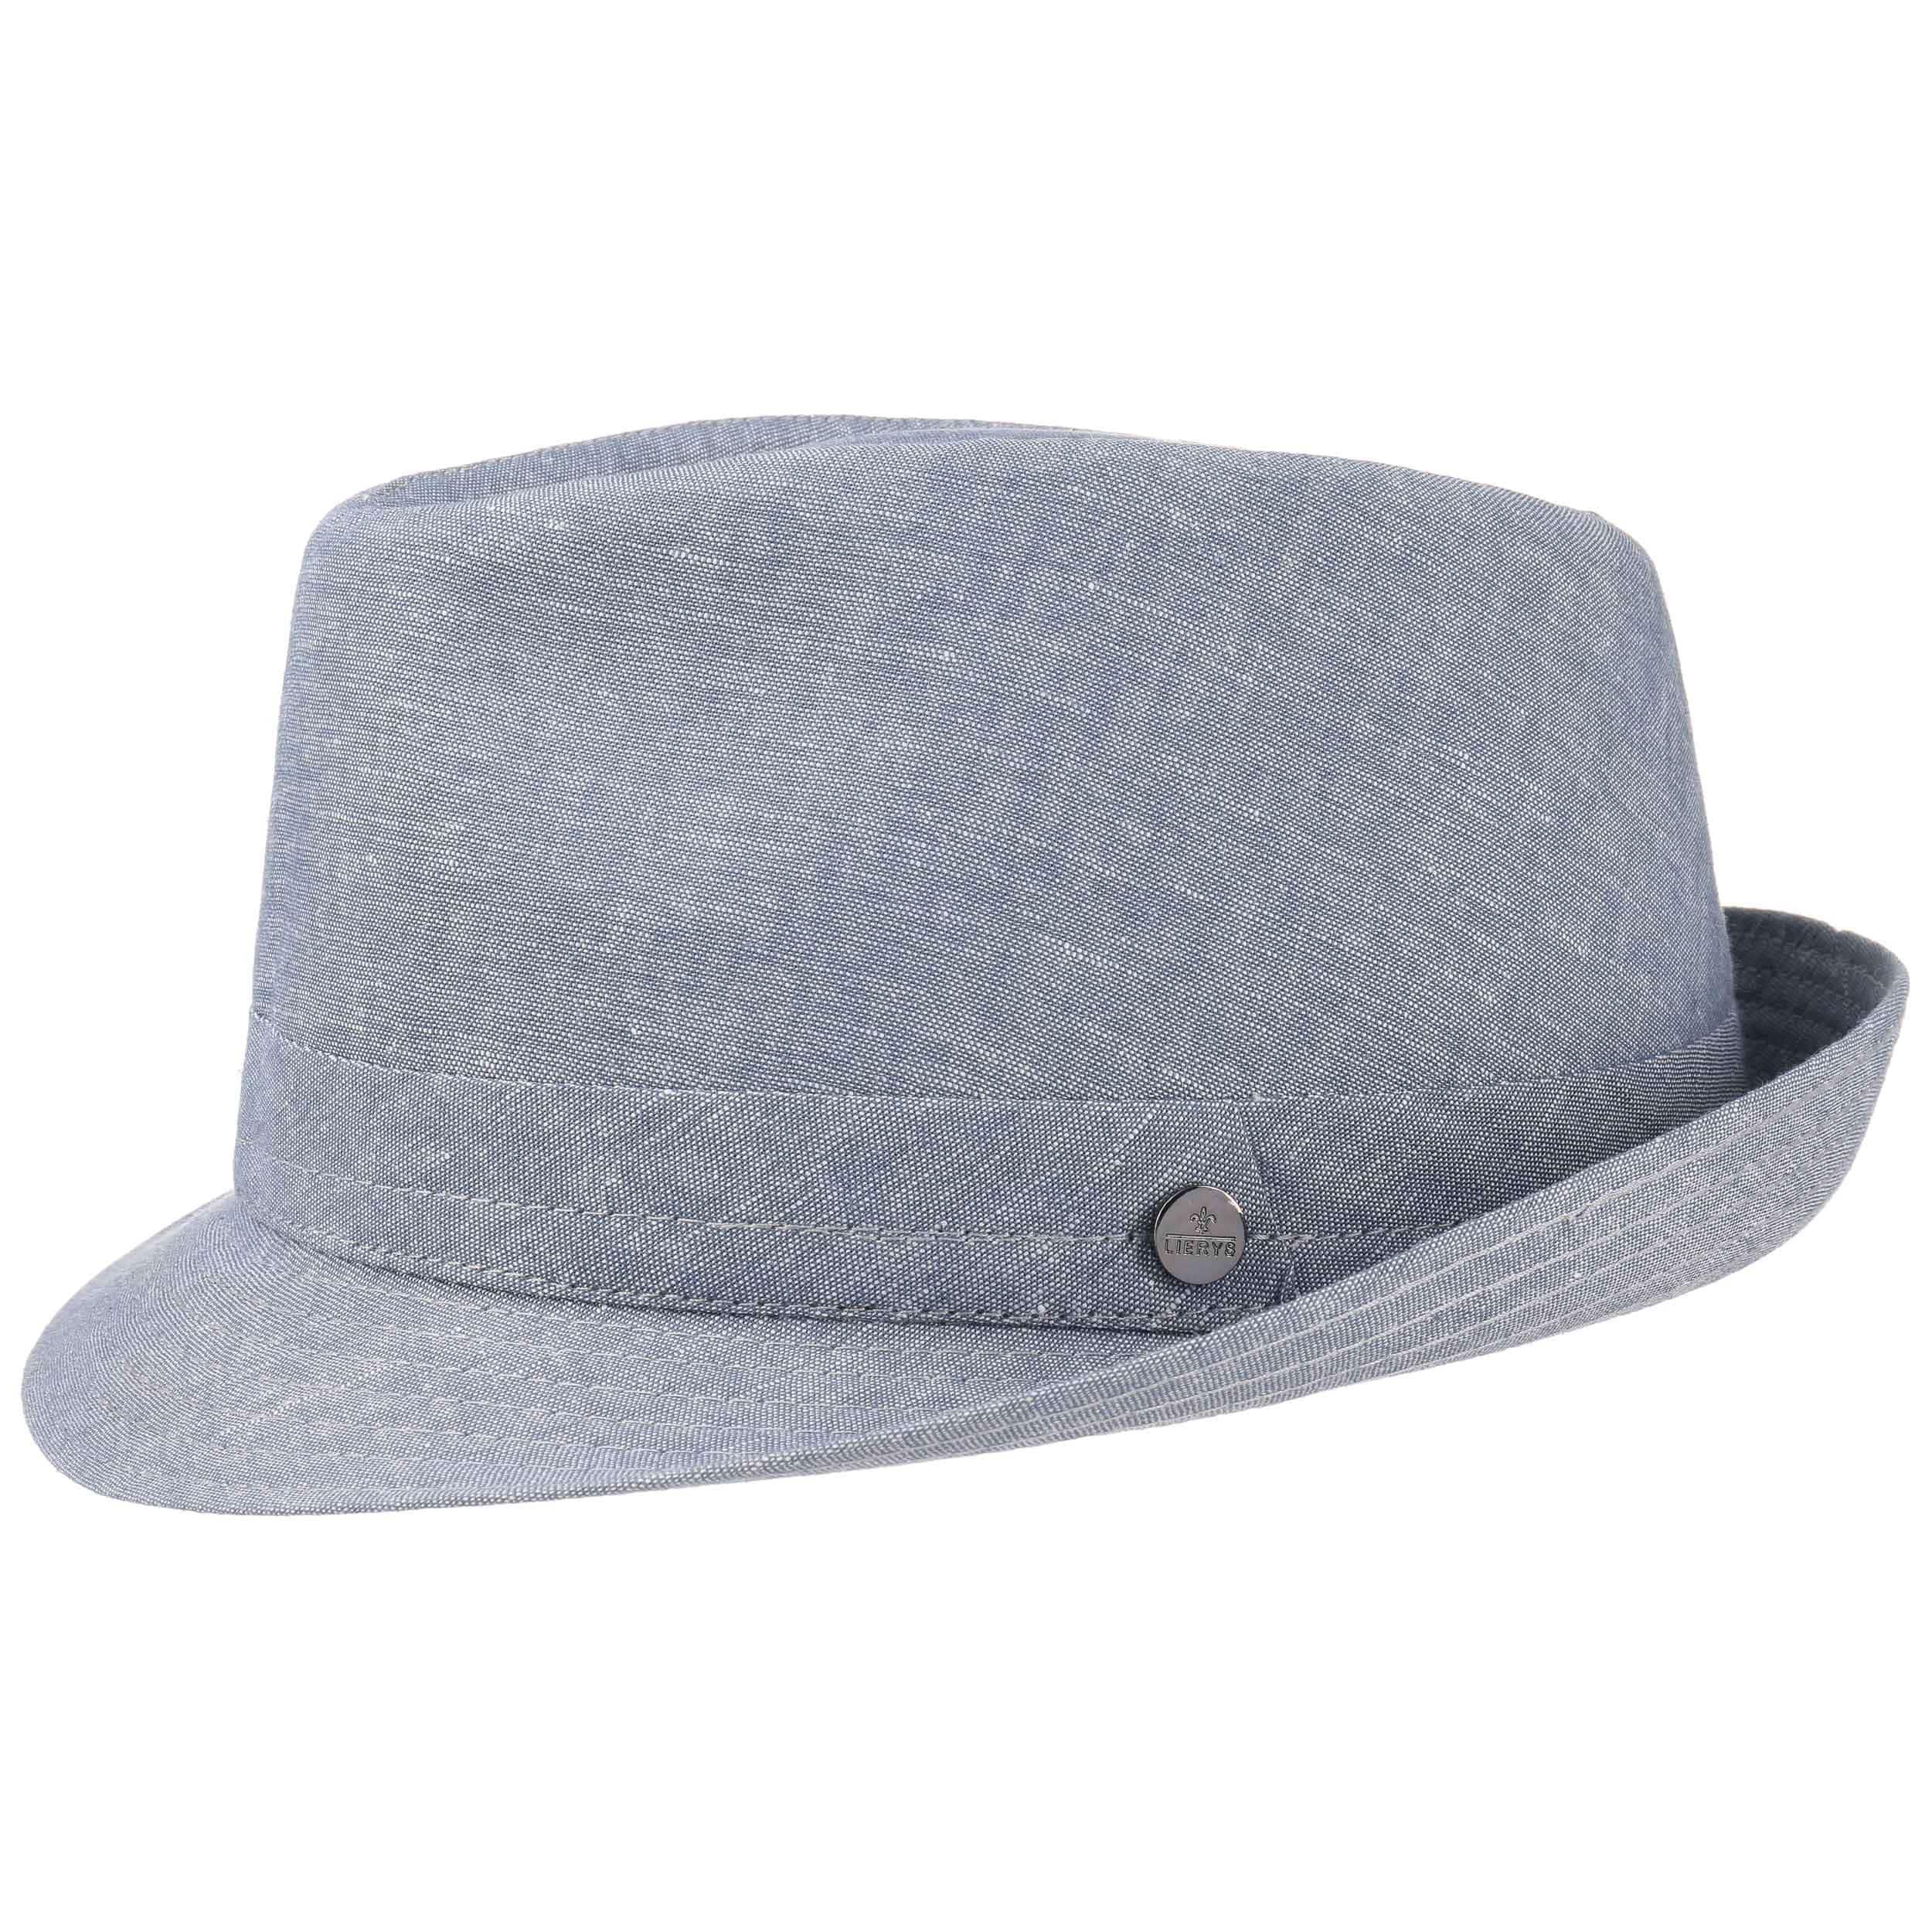 Misto Lino Linen Trilby Hat by Lierys Trilby hats Lierys P4ph3sY